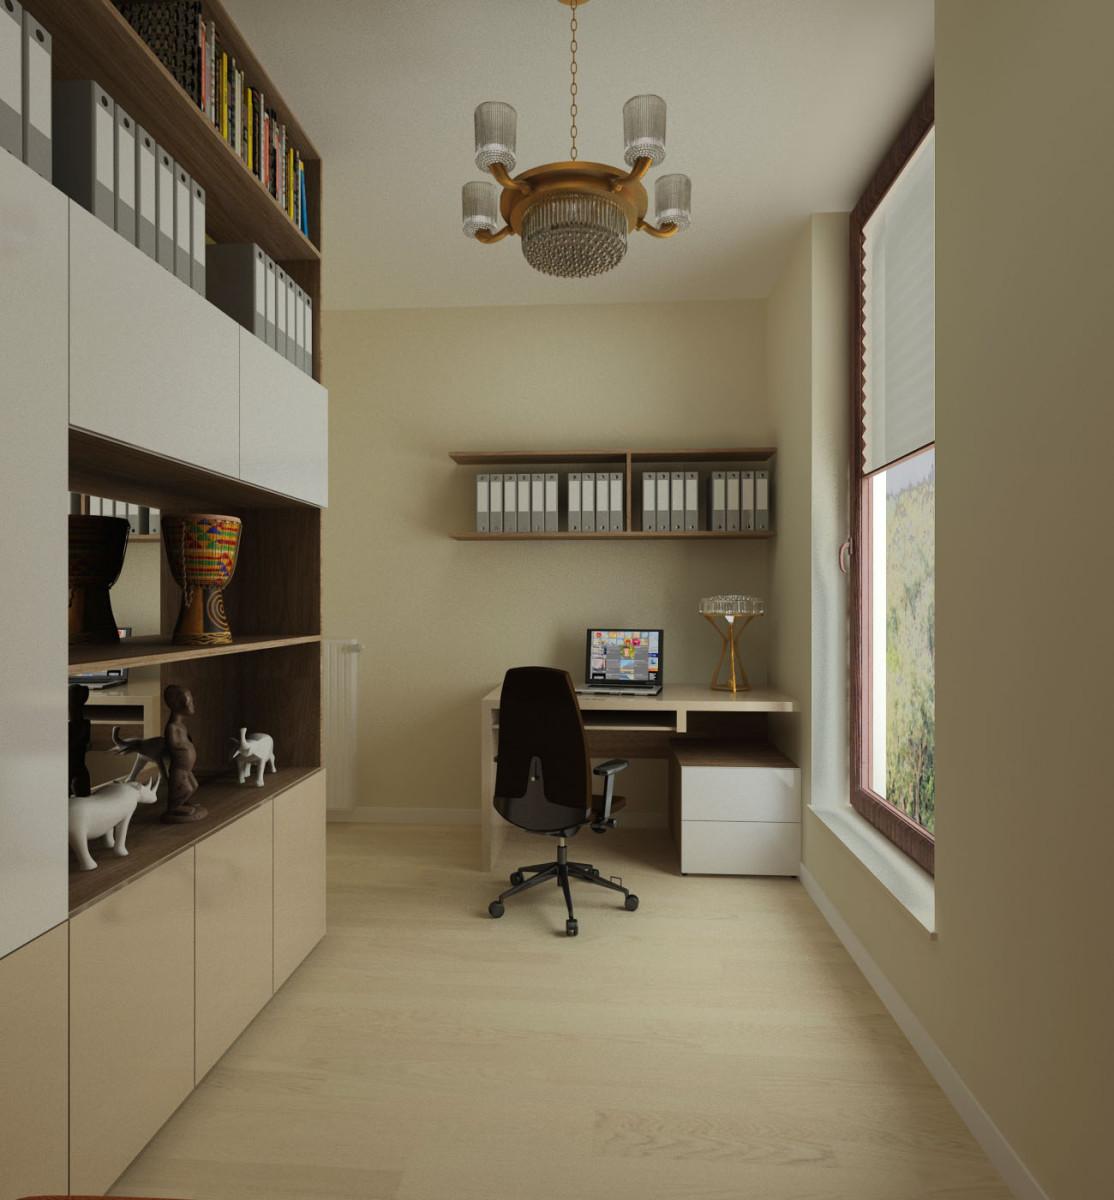 gabinet w mieszkaniu (1)